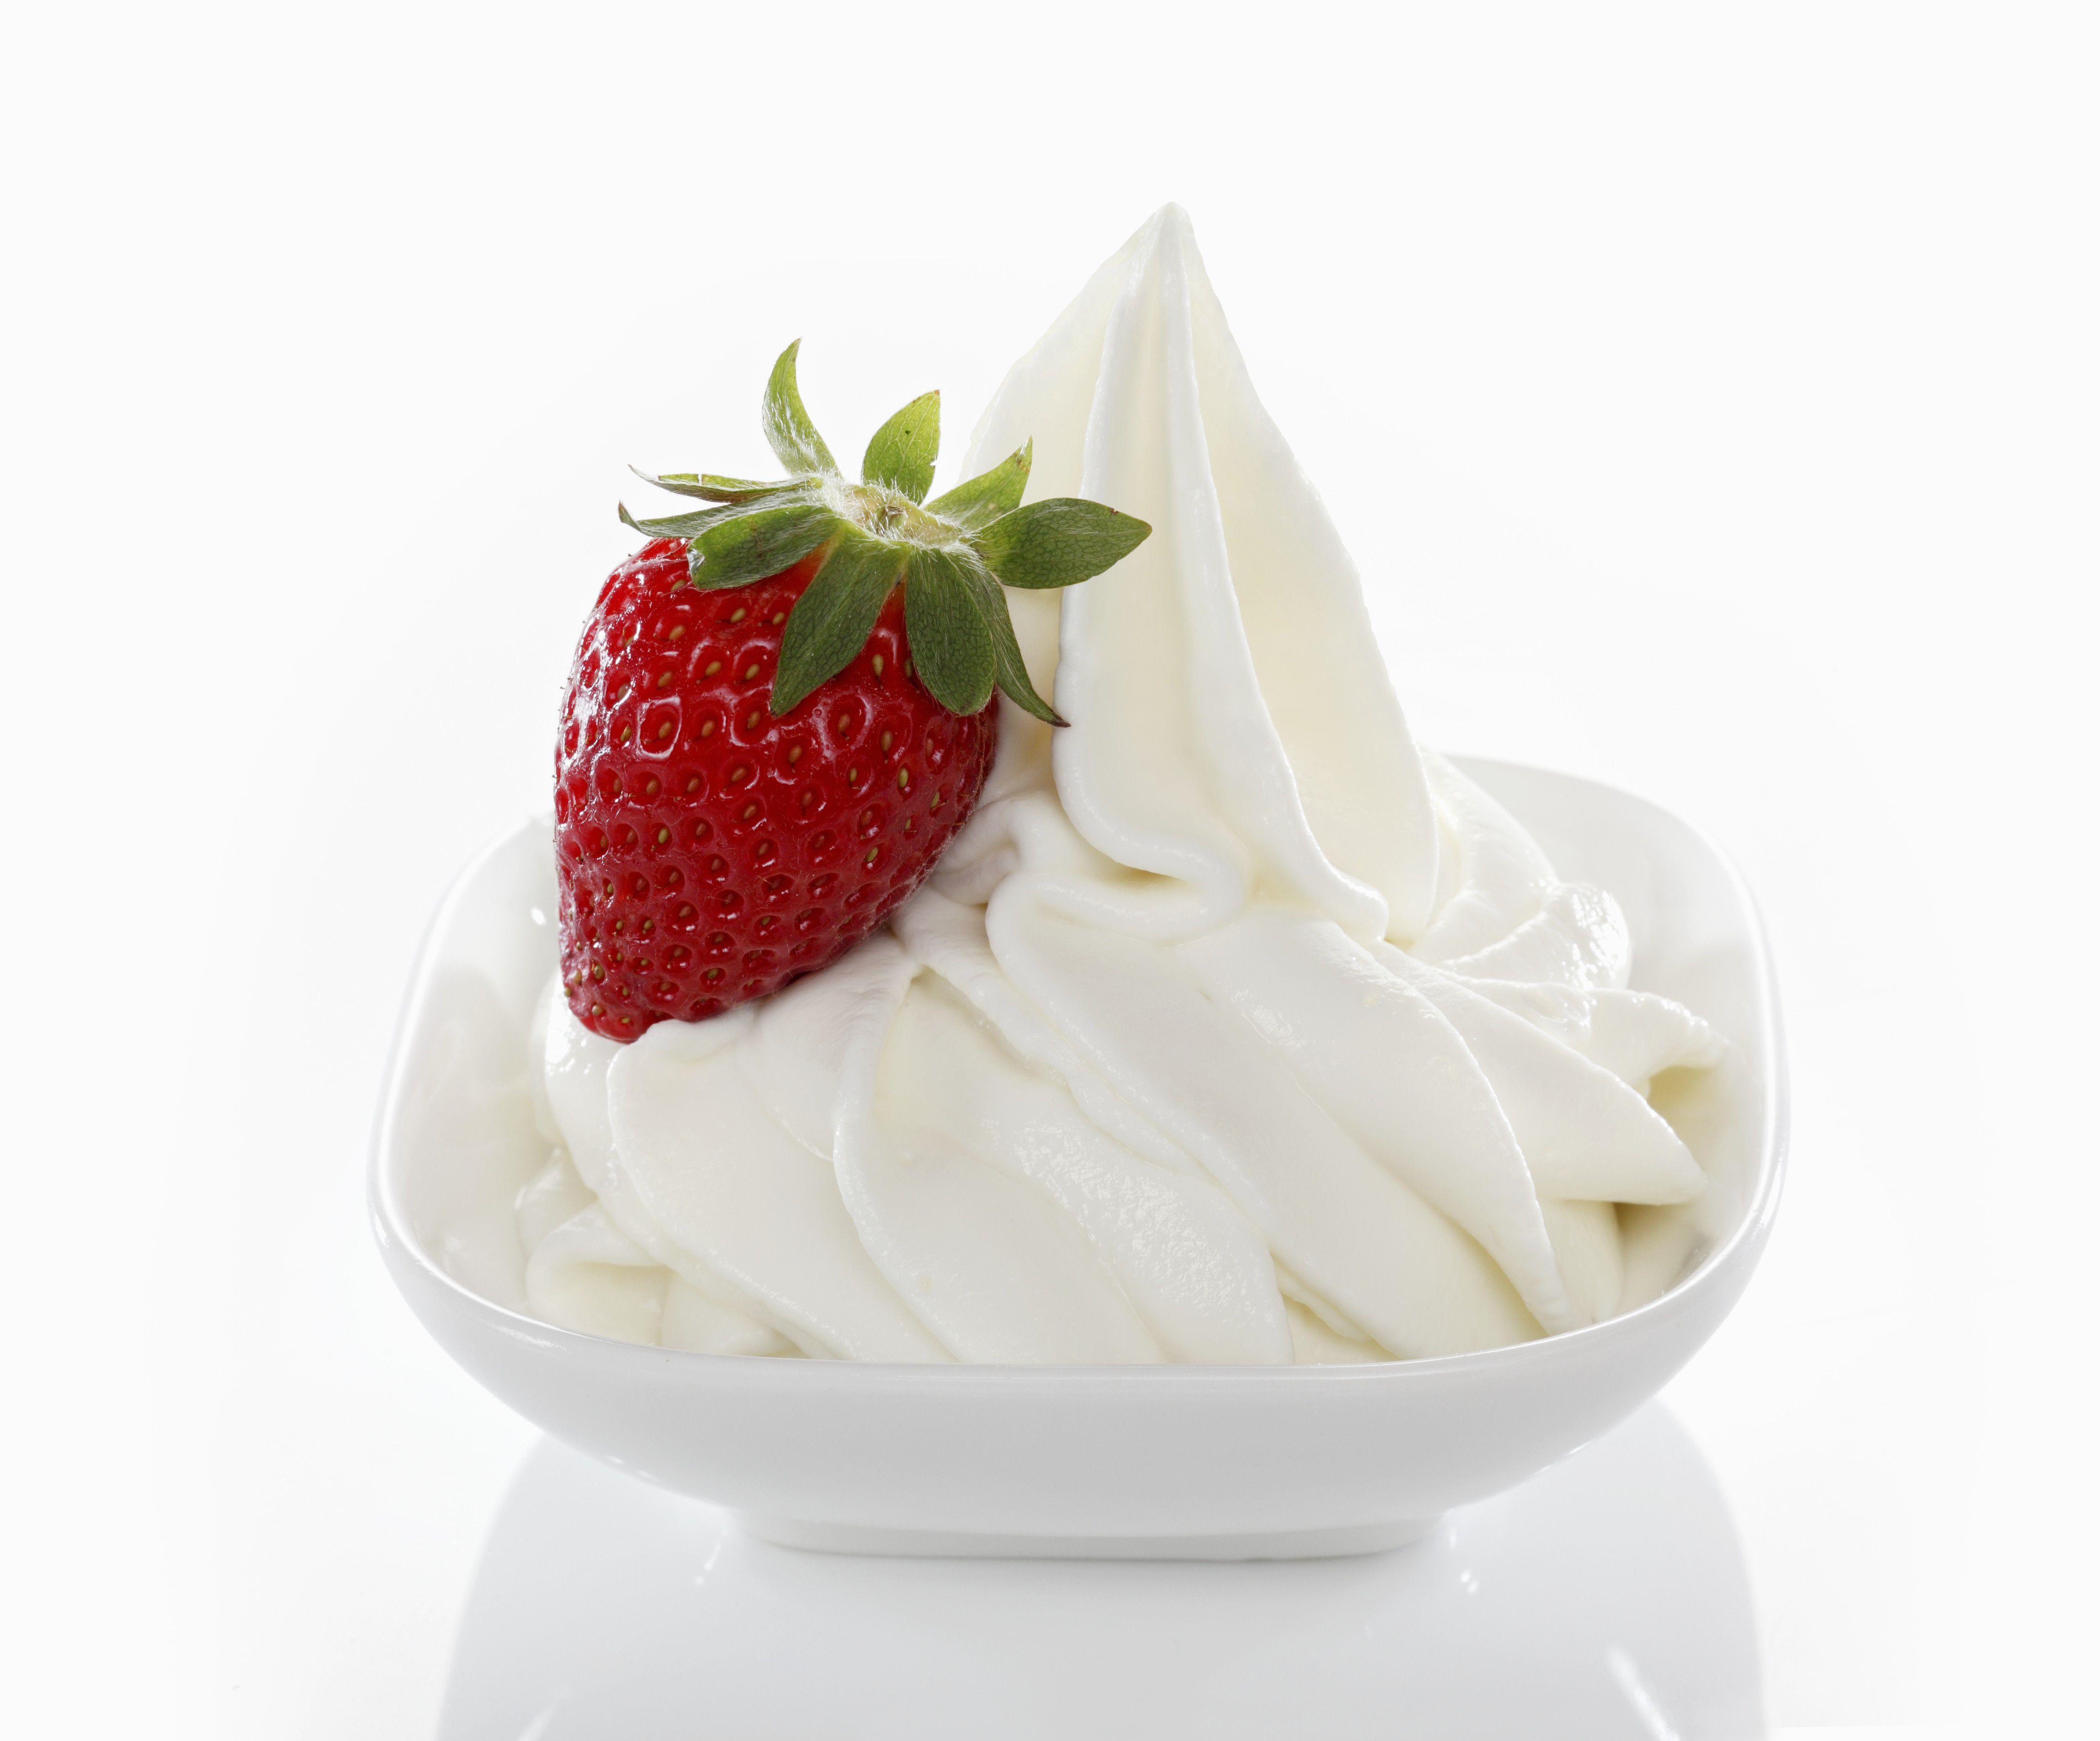 How To Make Homemade Yogurt In A Yogurt Maker